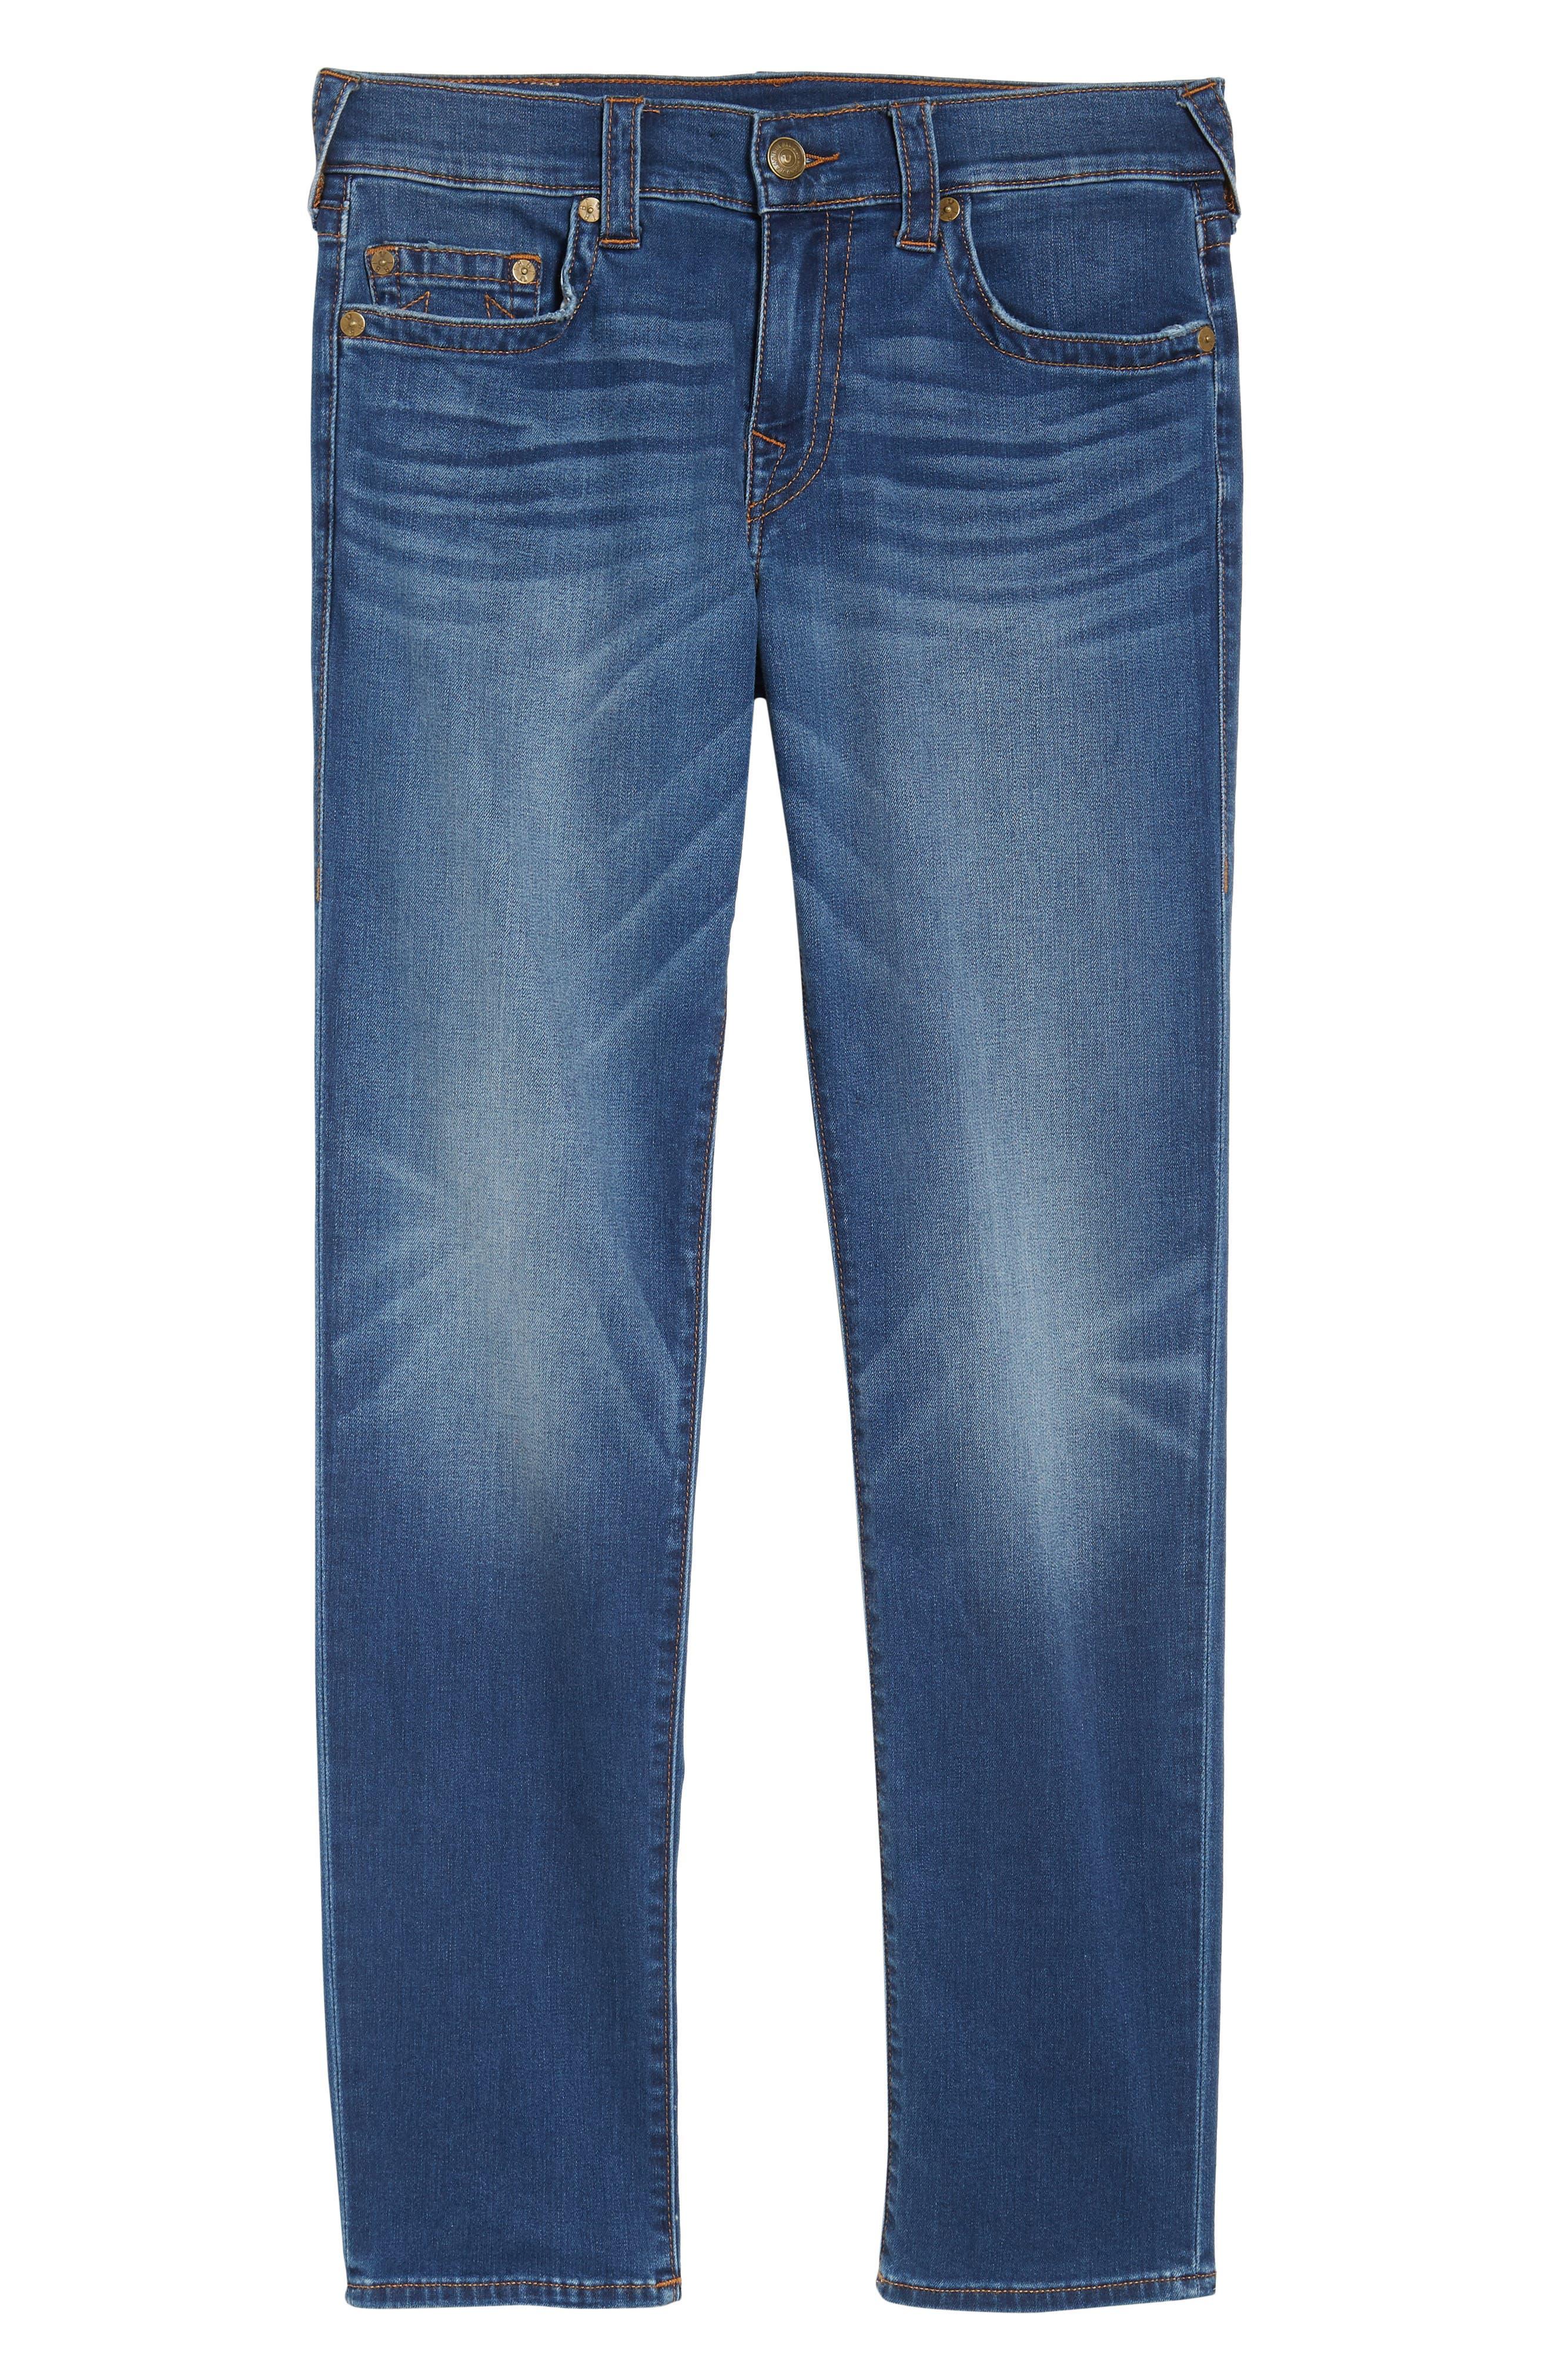 Geno Straight Leg Jeans,                             Alternate thumbnail 6, color,                             Indigo Lake